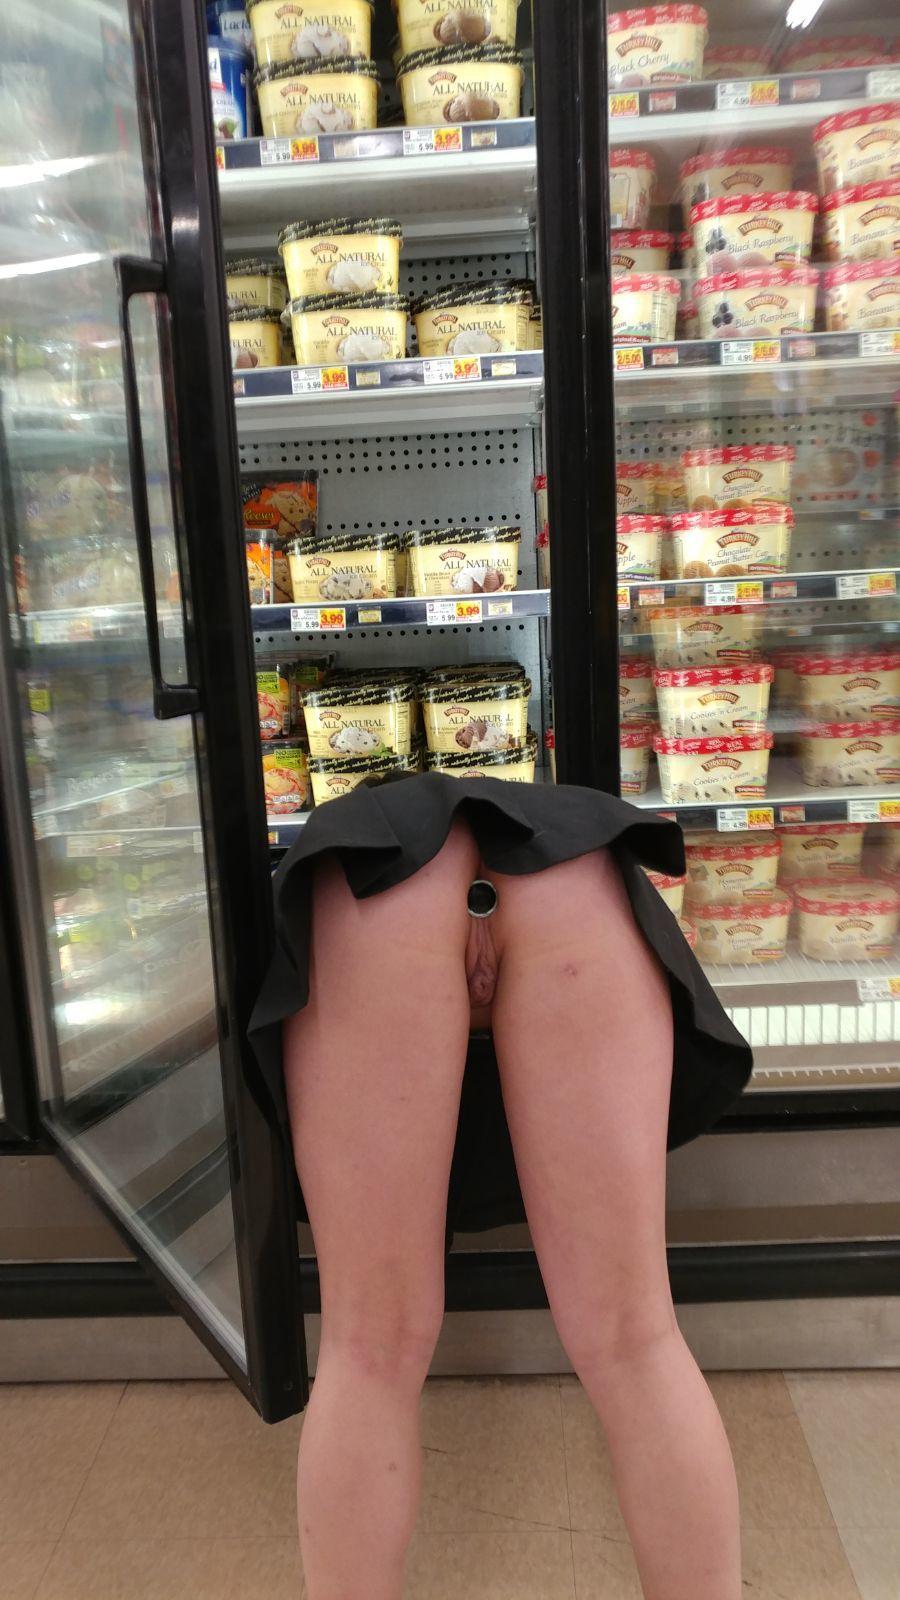 karley sciortino shaves vagina mobile porn videos #Public #Exhibitionist #AnalPlug #Pussy #Ass #Skirt #Upskirt #NoPanties #Hot #Sexy #Lewd #Slutty #BendOver